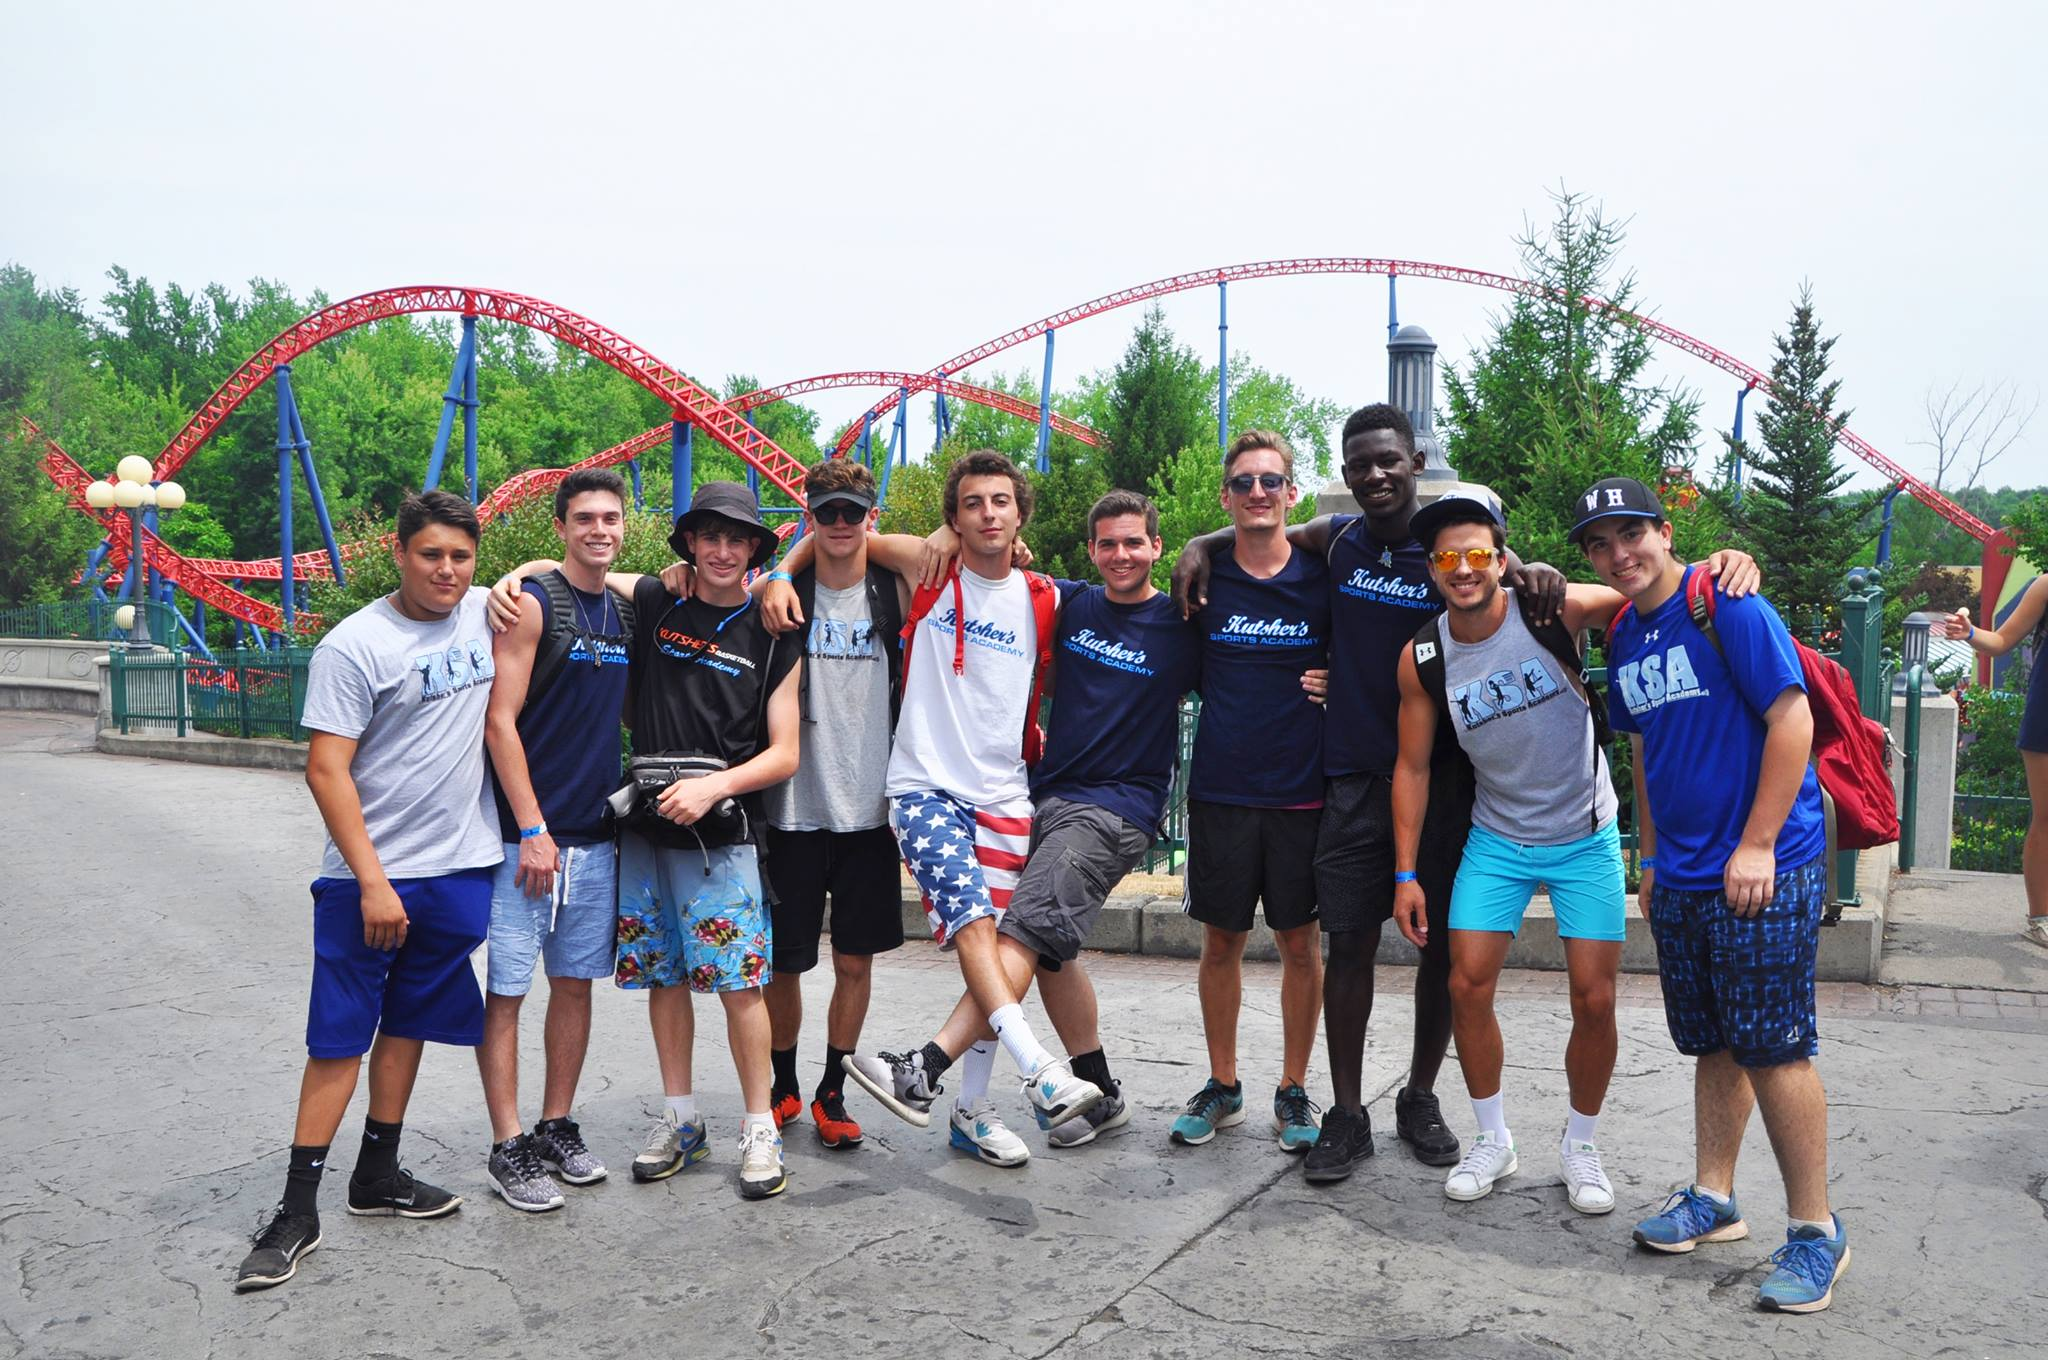 Summer Program - Volleyball | Kutsher's Sports Academy